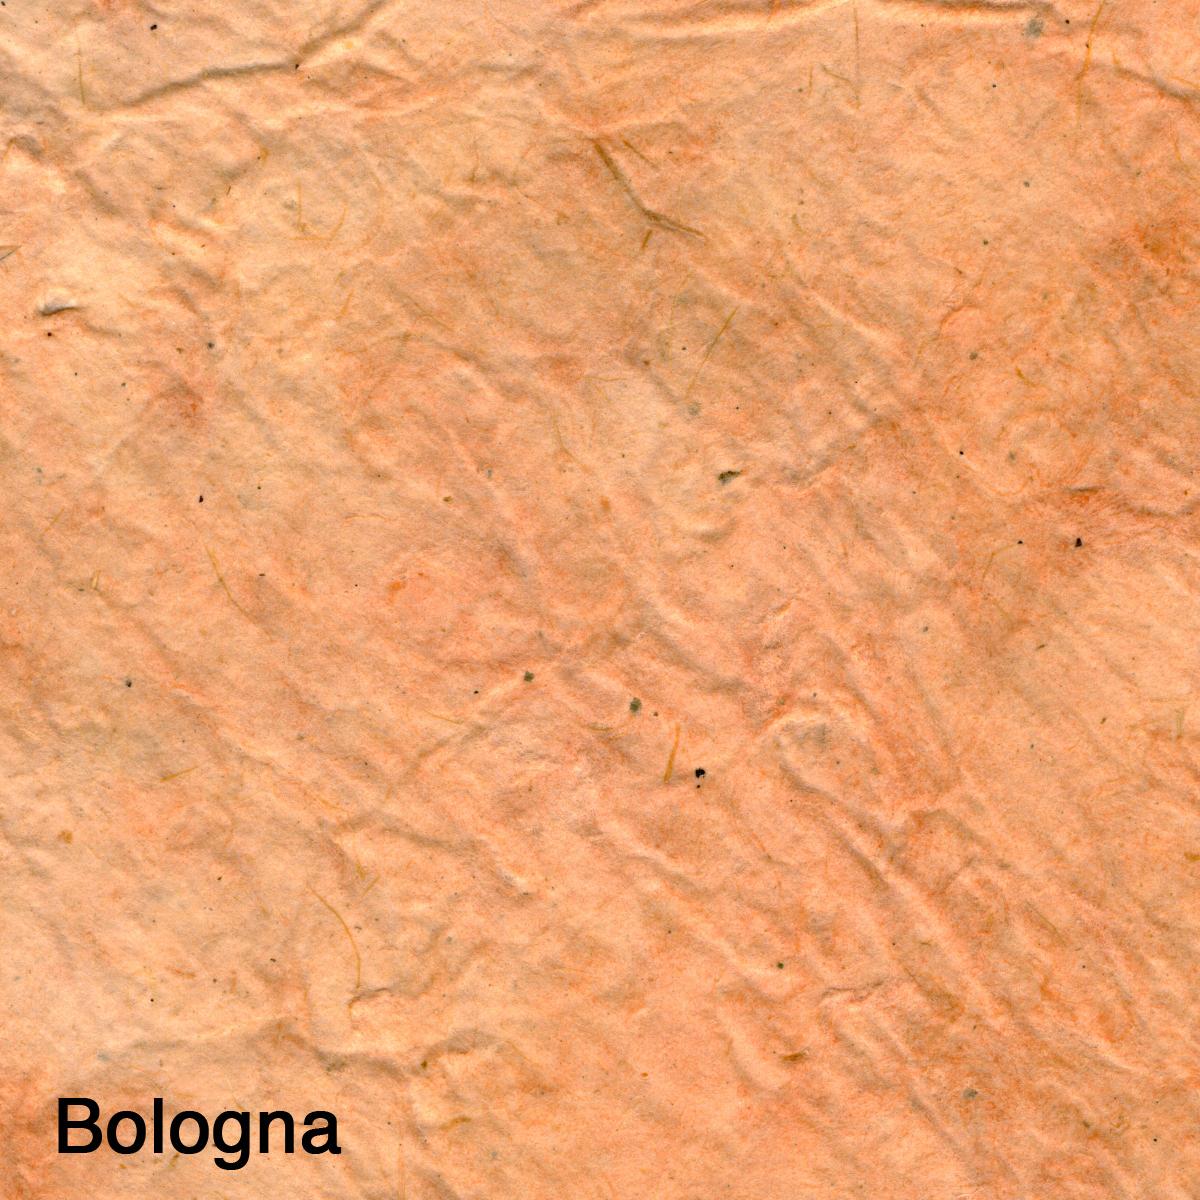 Bolagna004.jpg